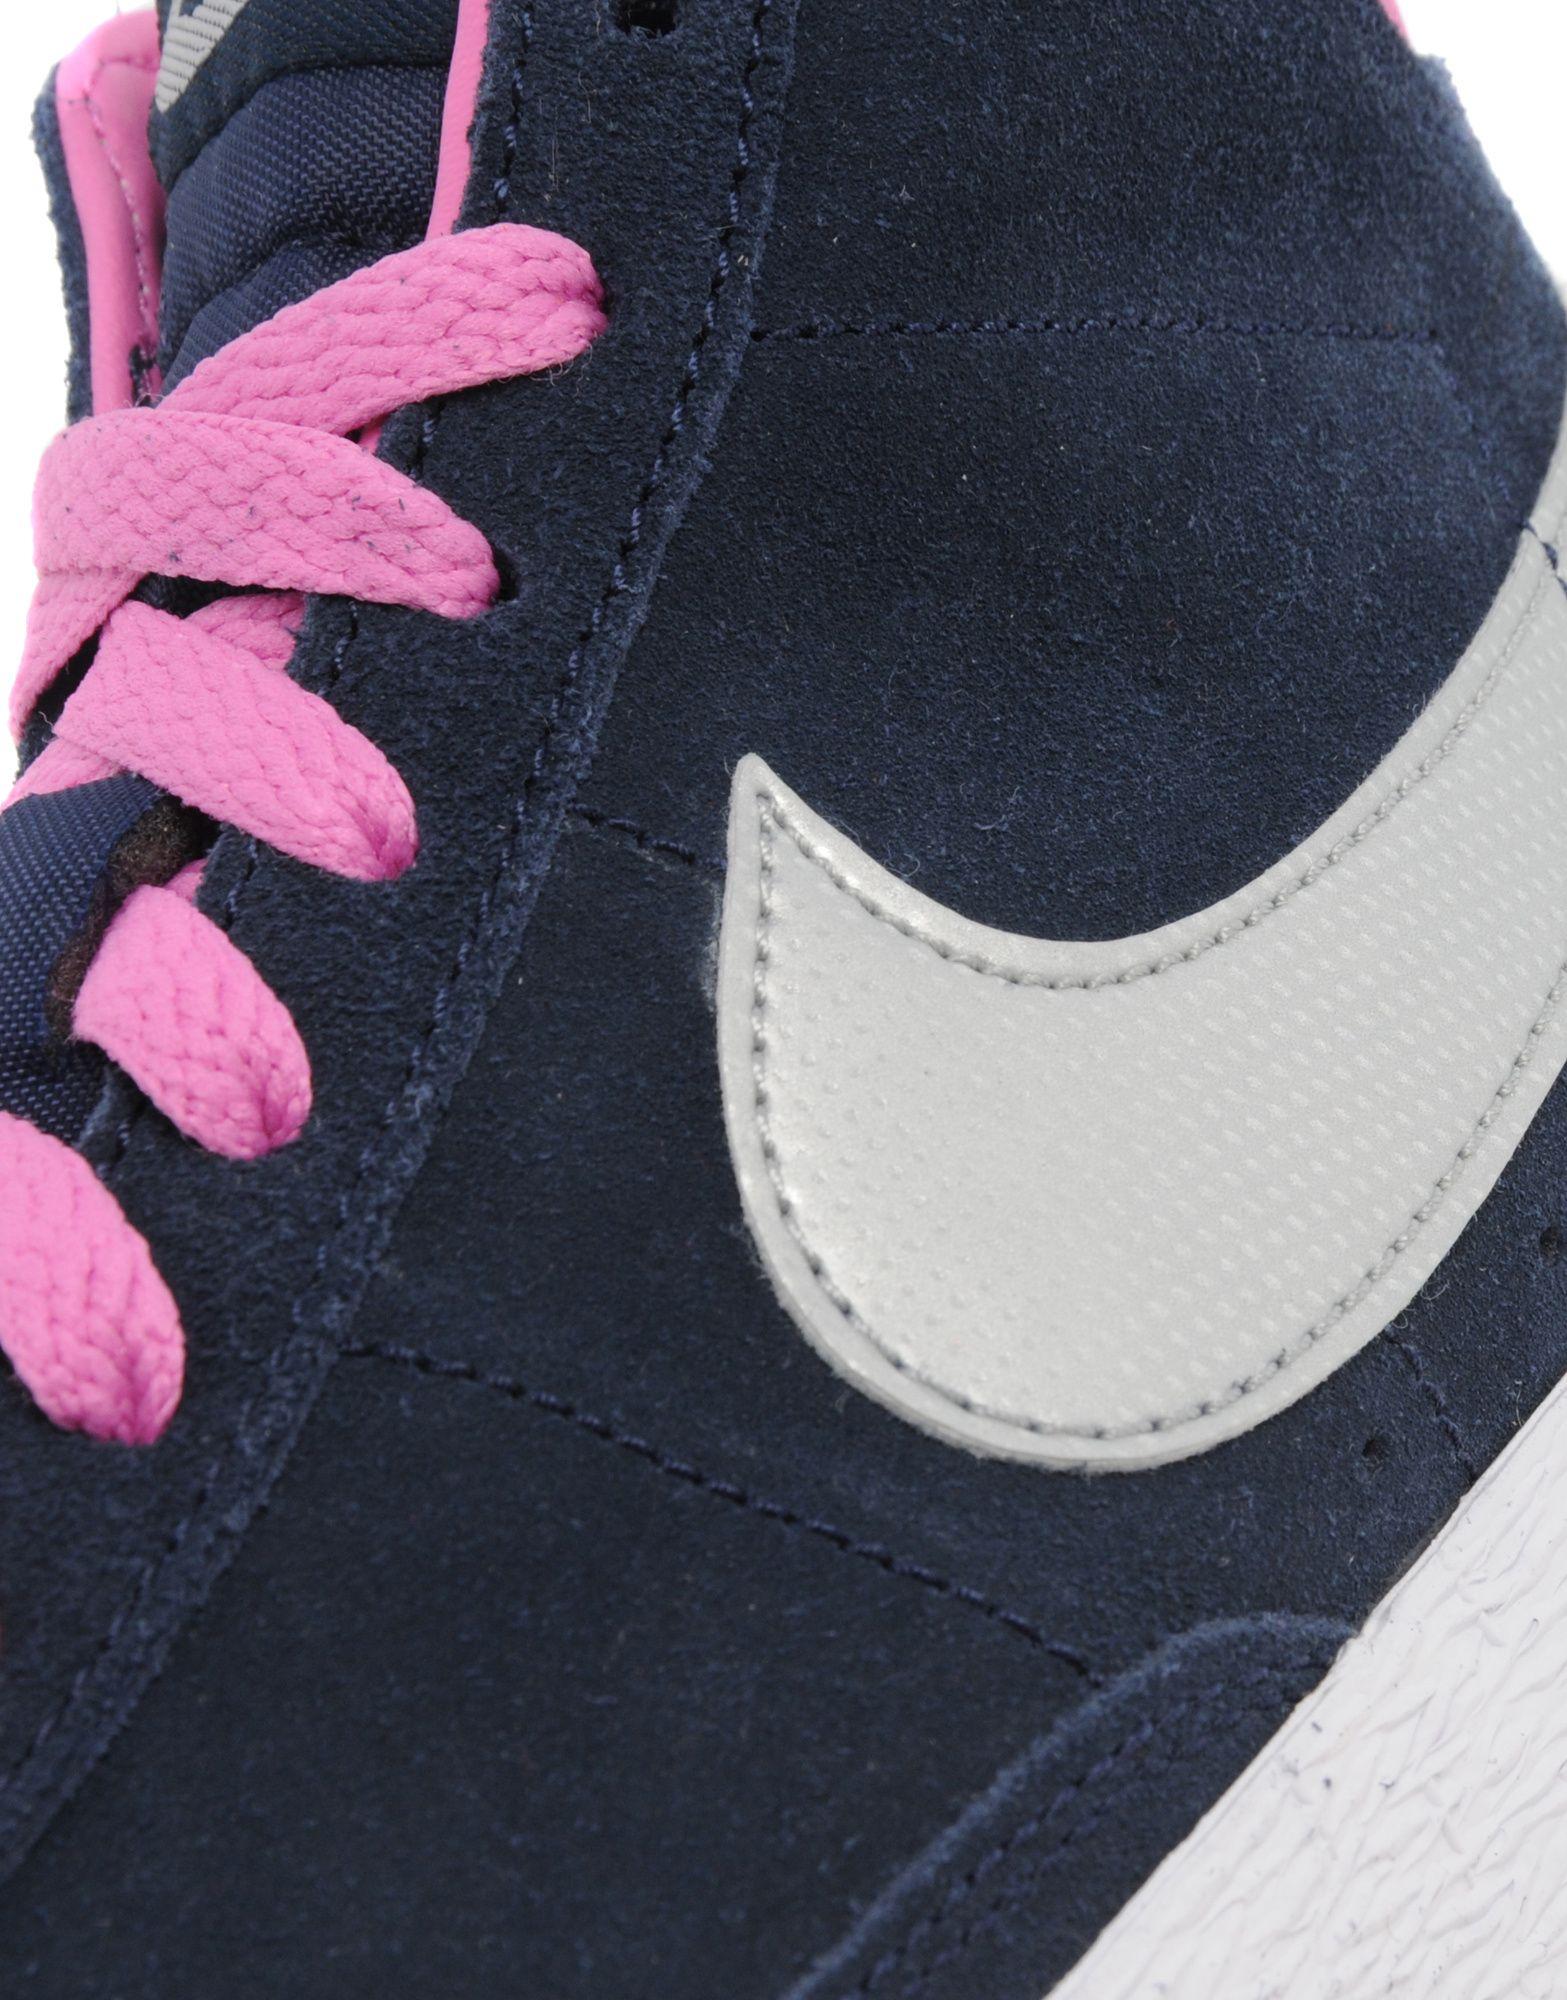 Nike Blazer Mid Childrens